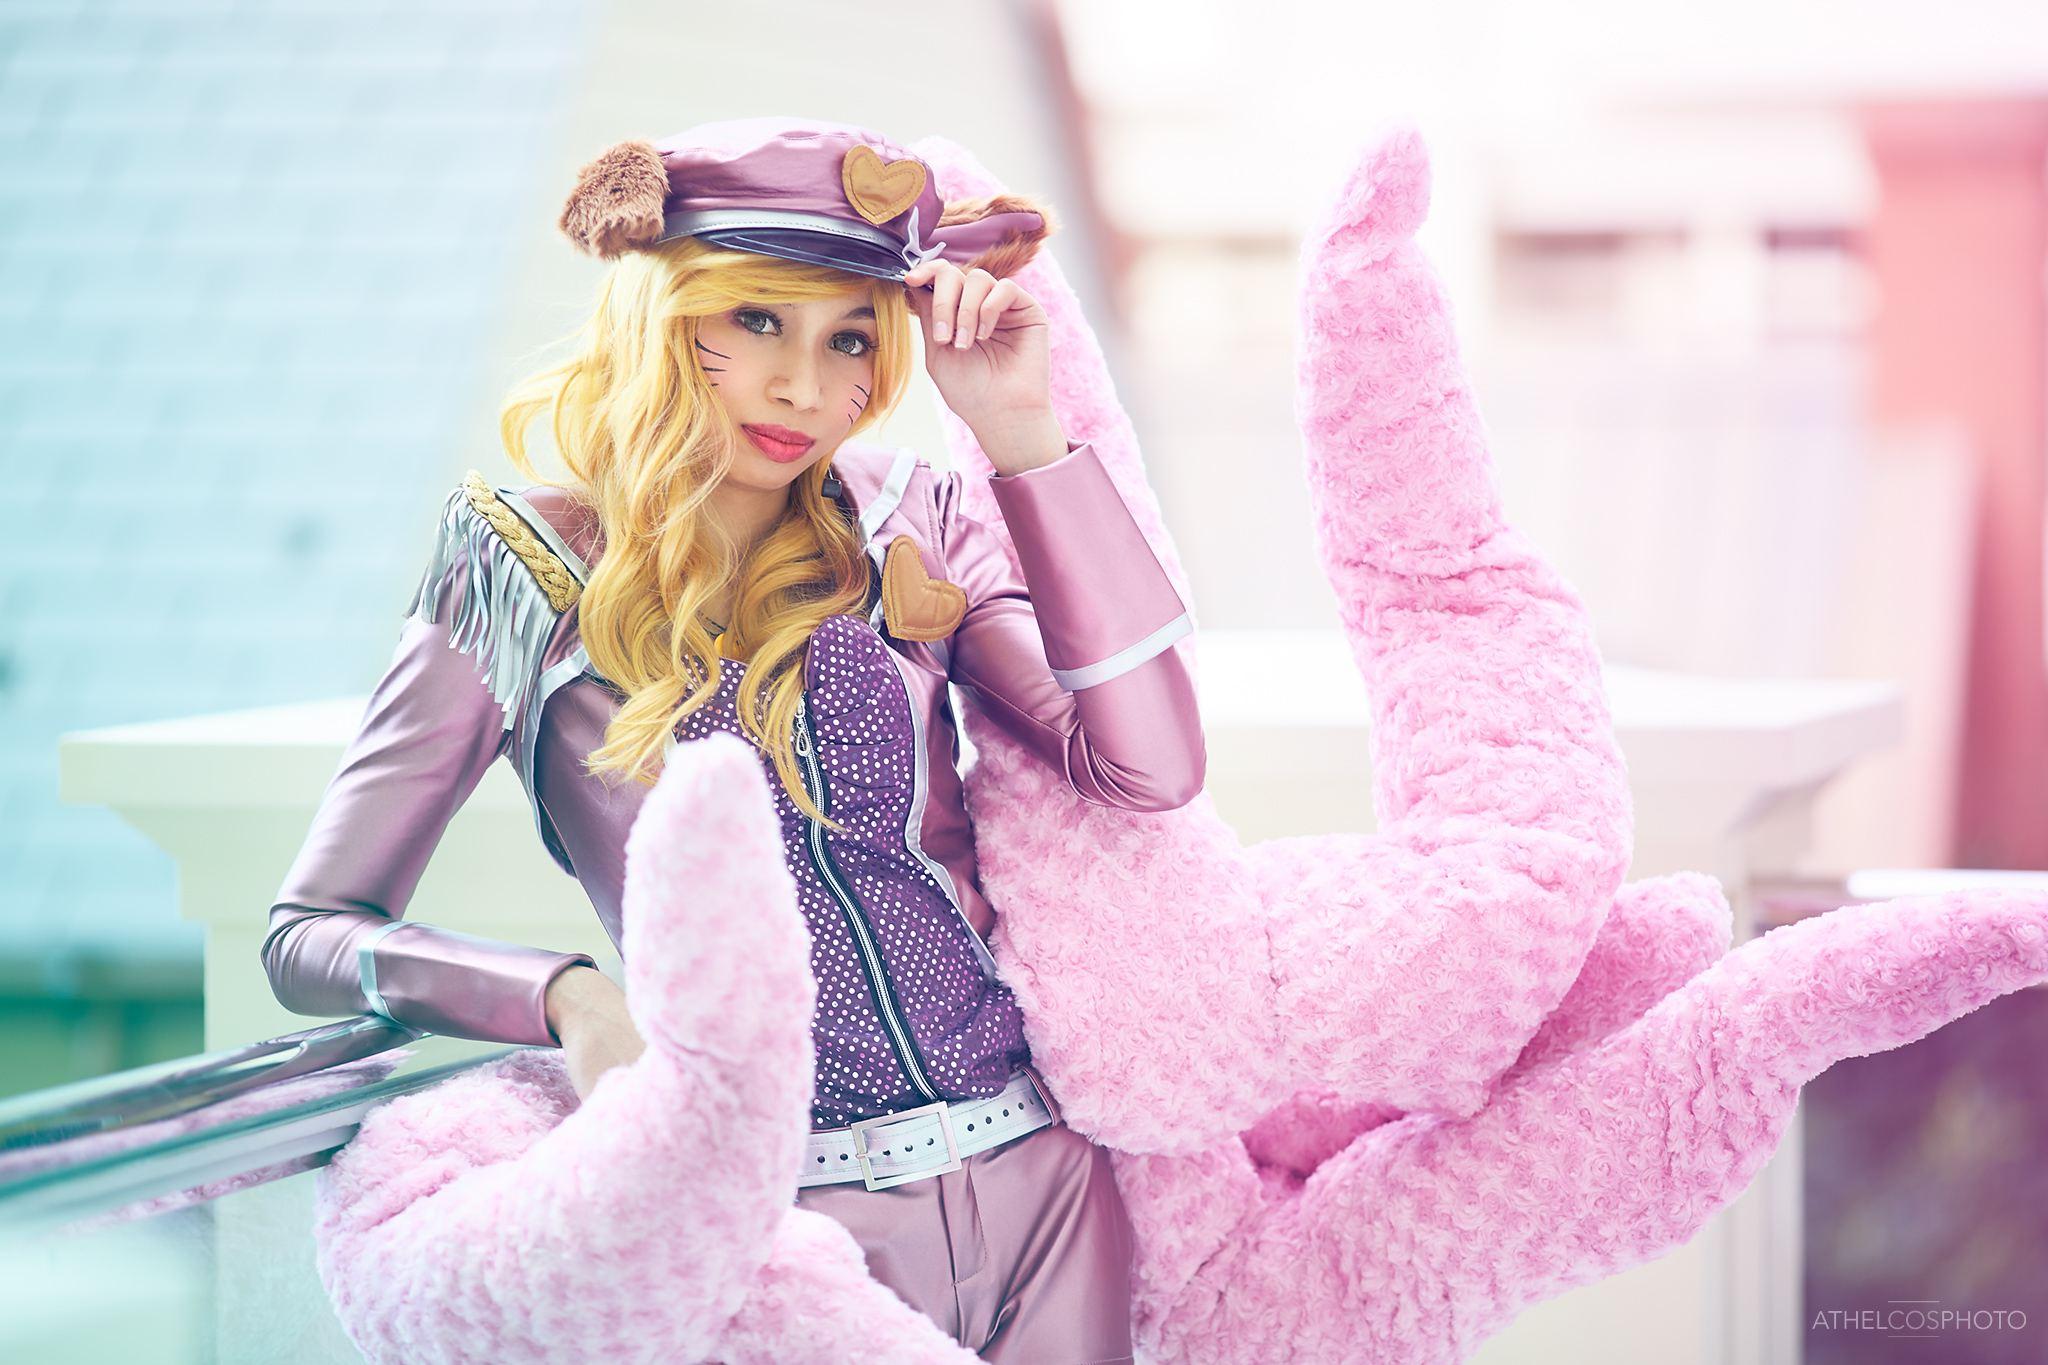 Image: Athel Cosplay Photography Cosplay: Rose Monroe